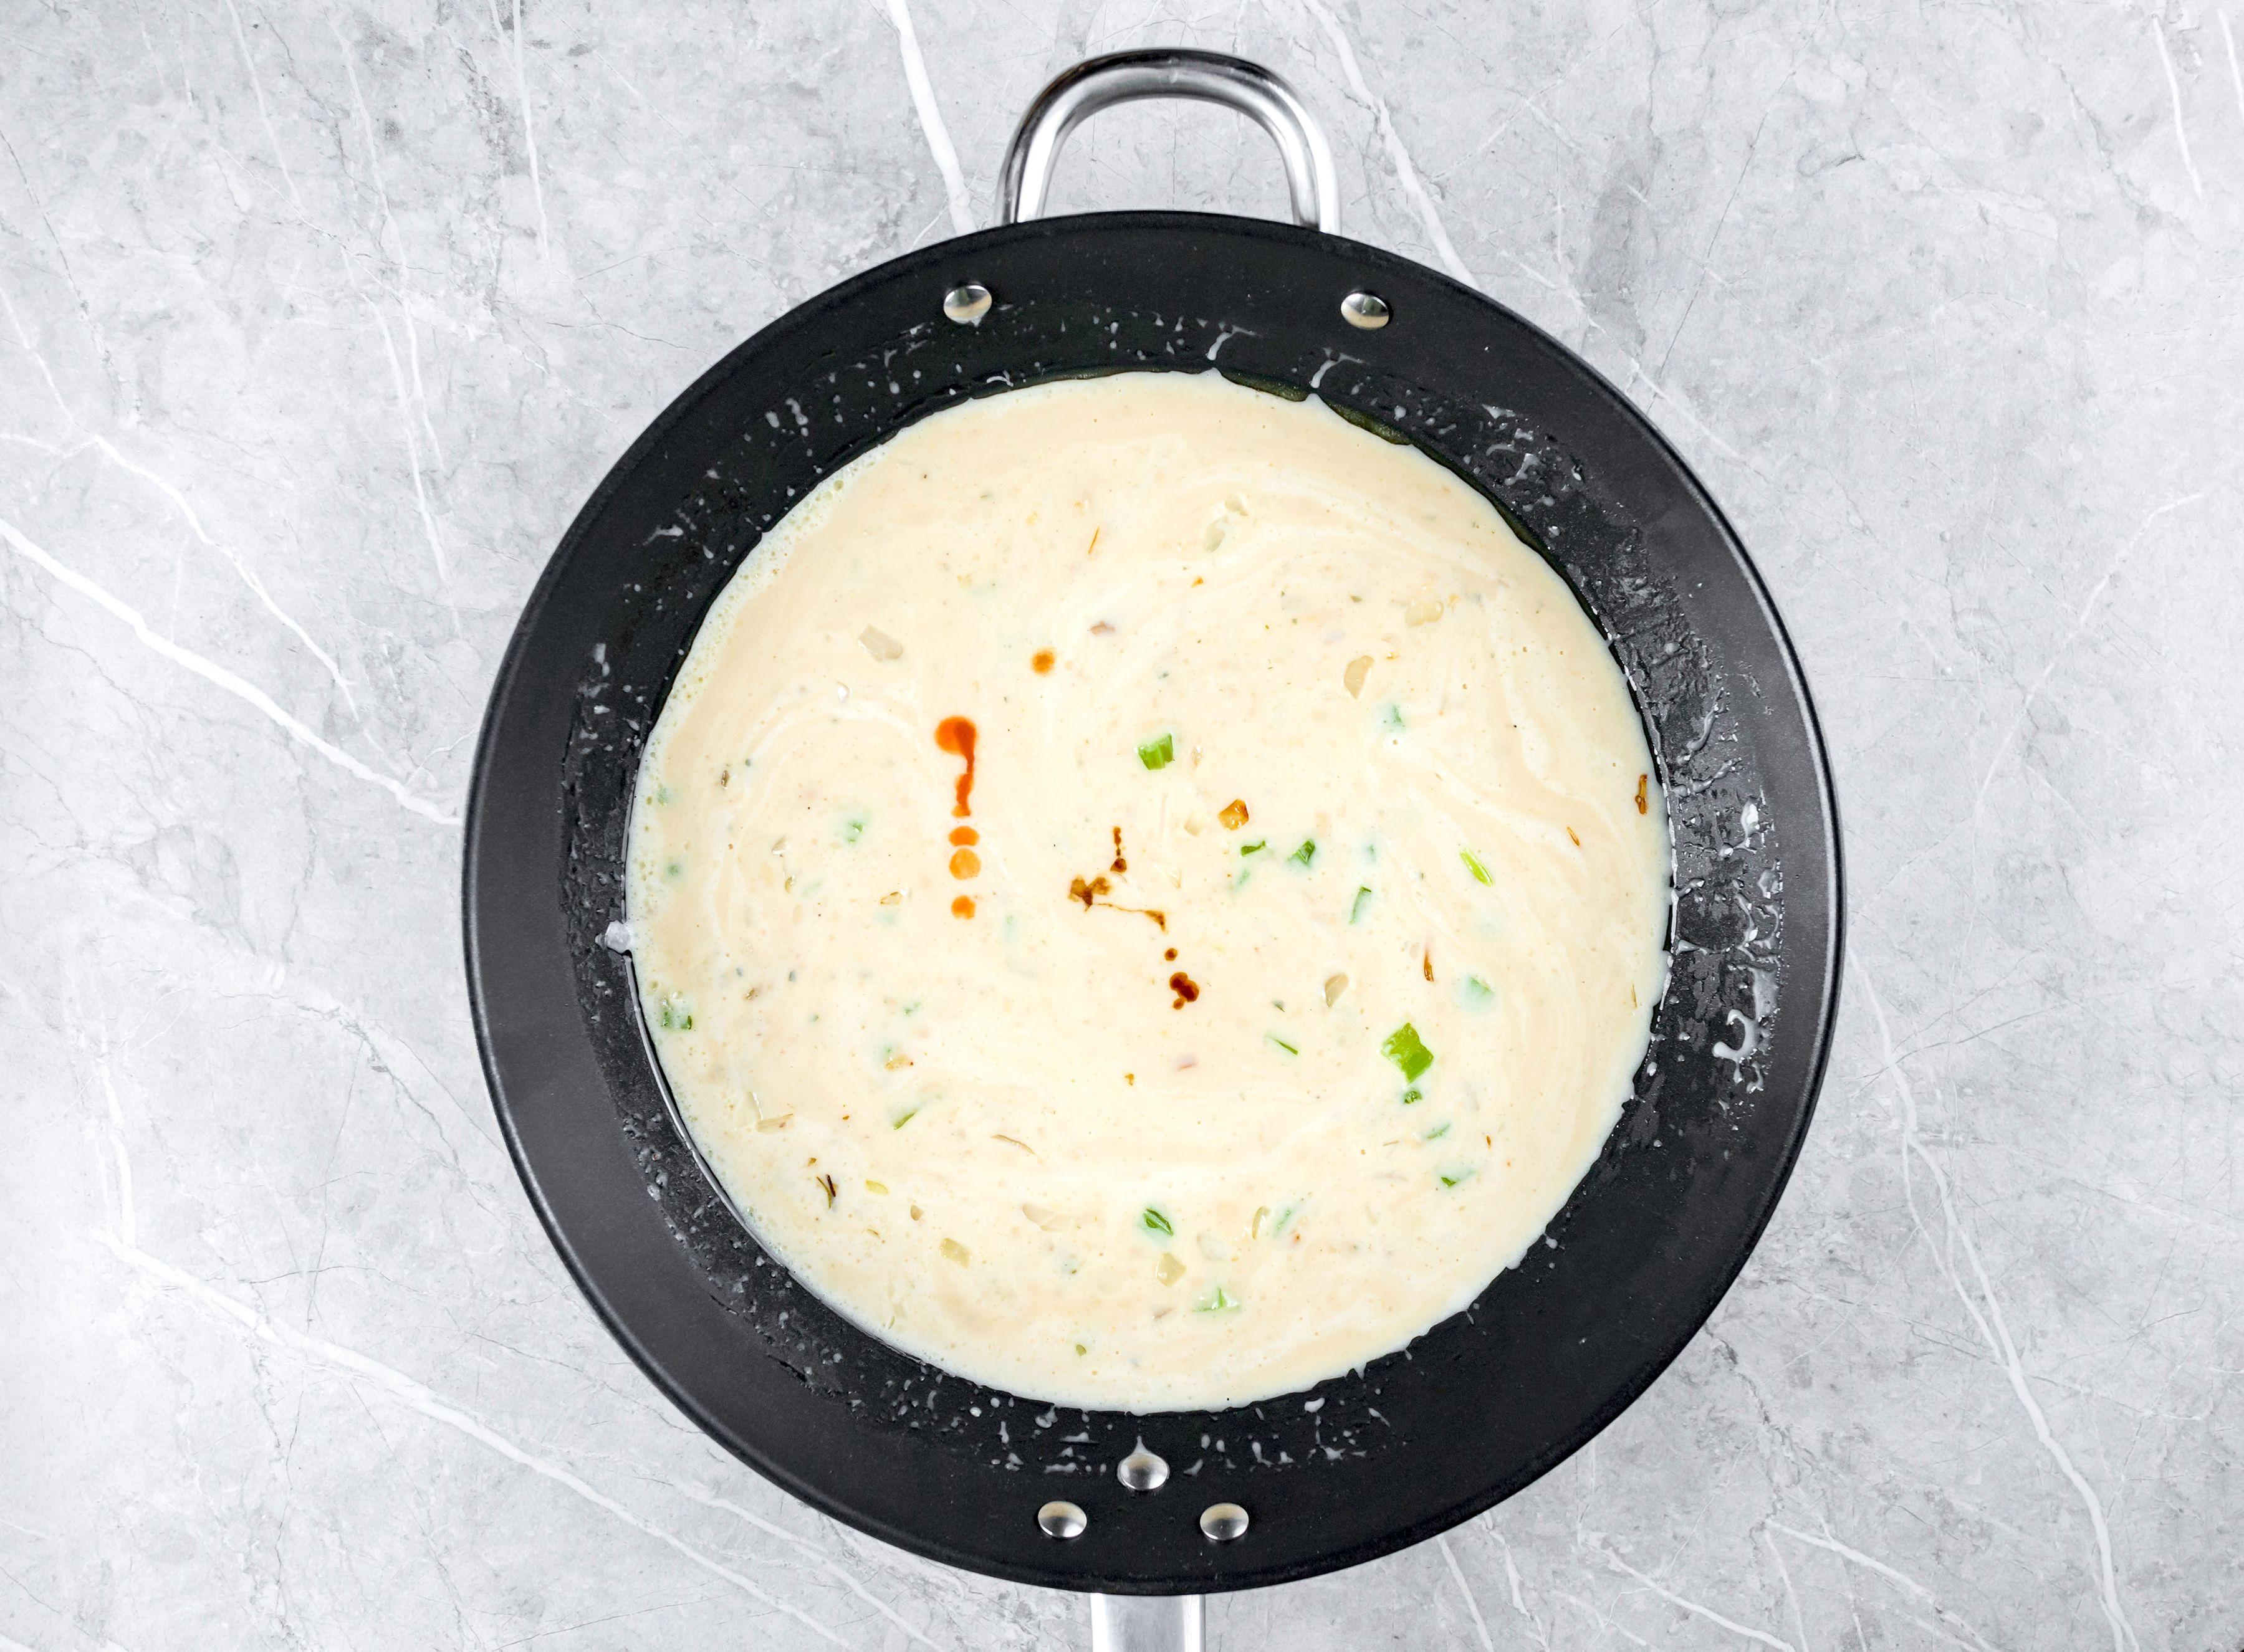 Simmering cream of mushroom soup, milk, Worcestershire, and Tabasco